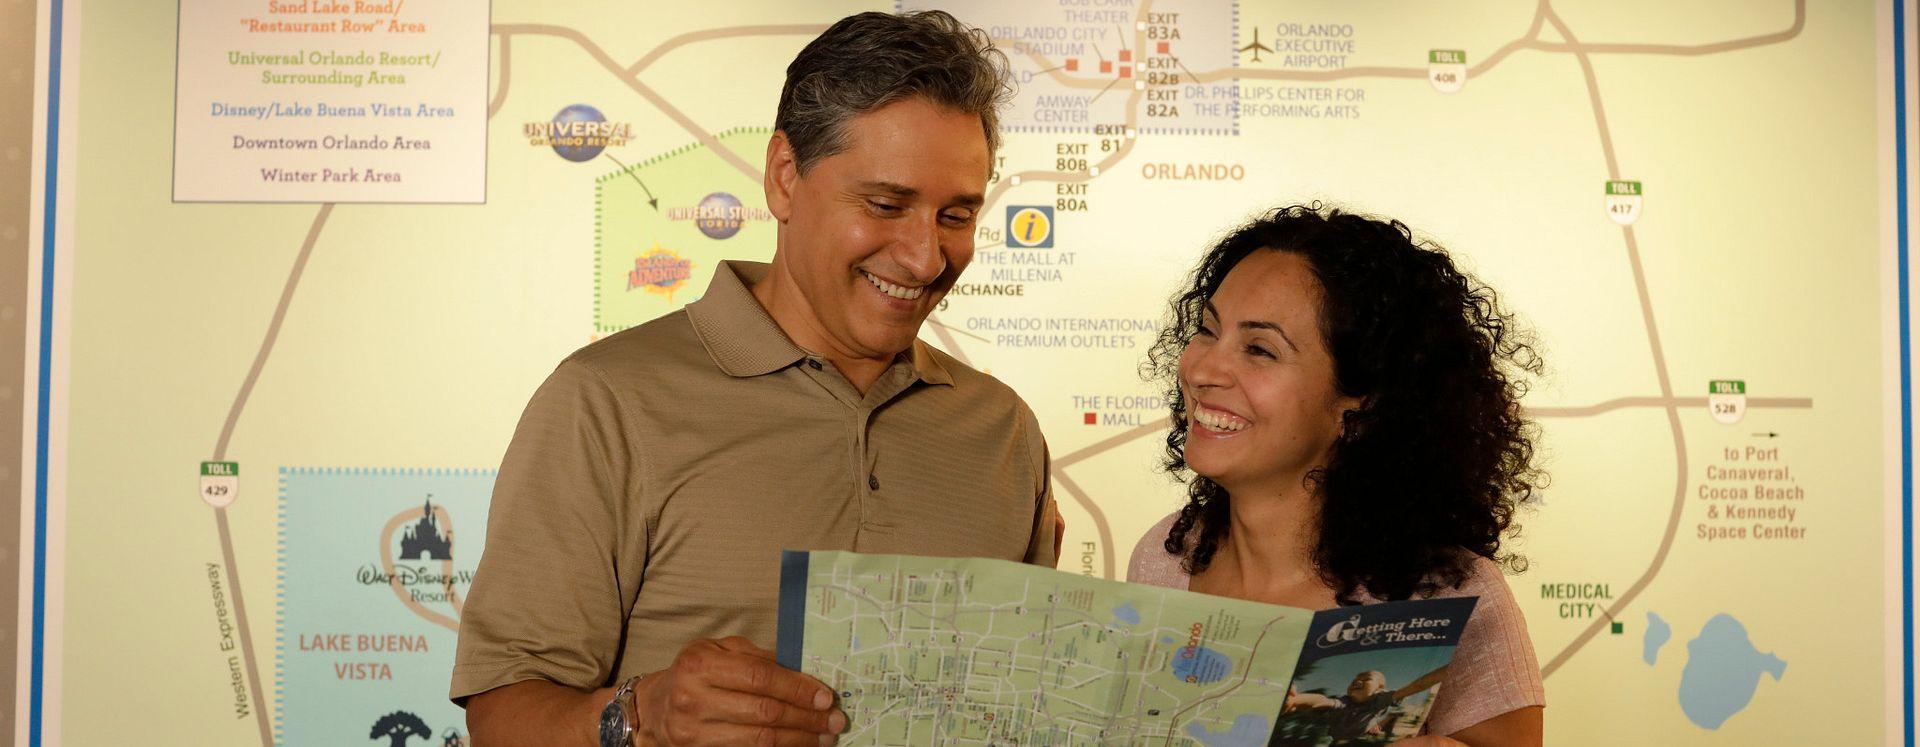 pareja mirando los mapas de Orlando